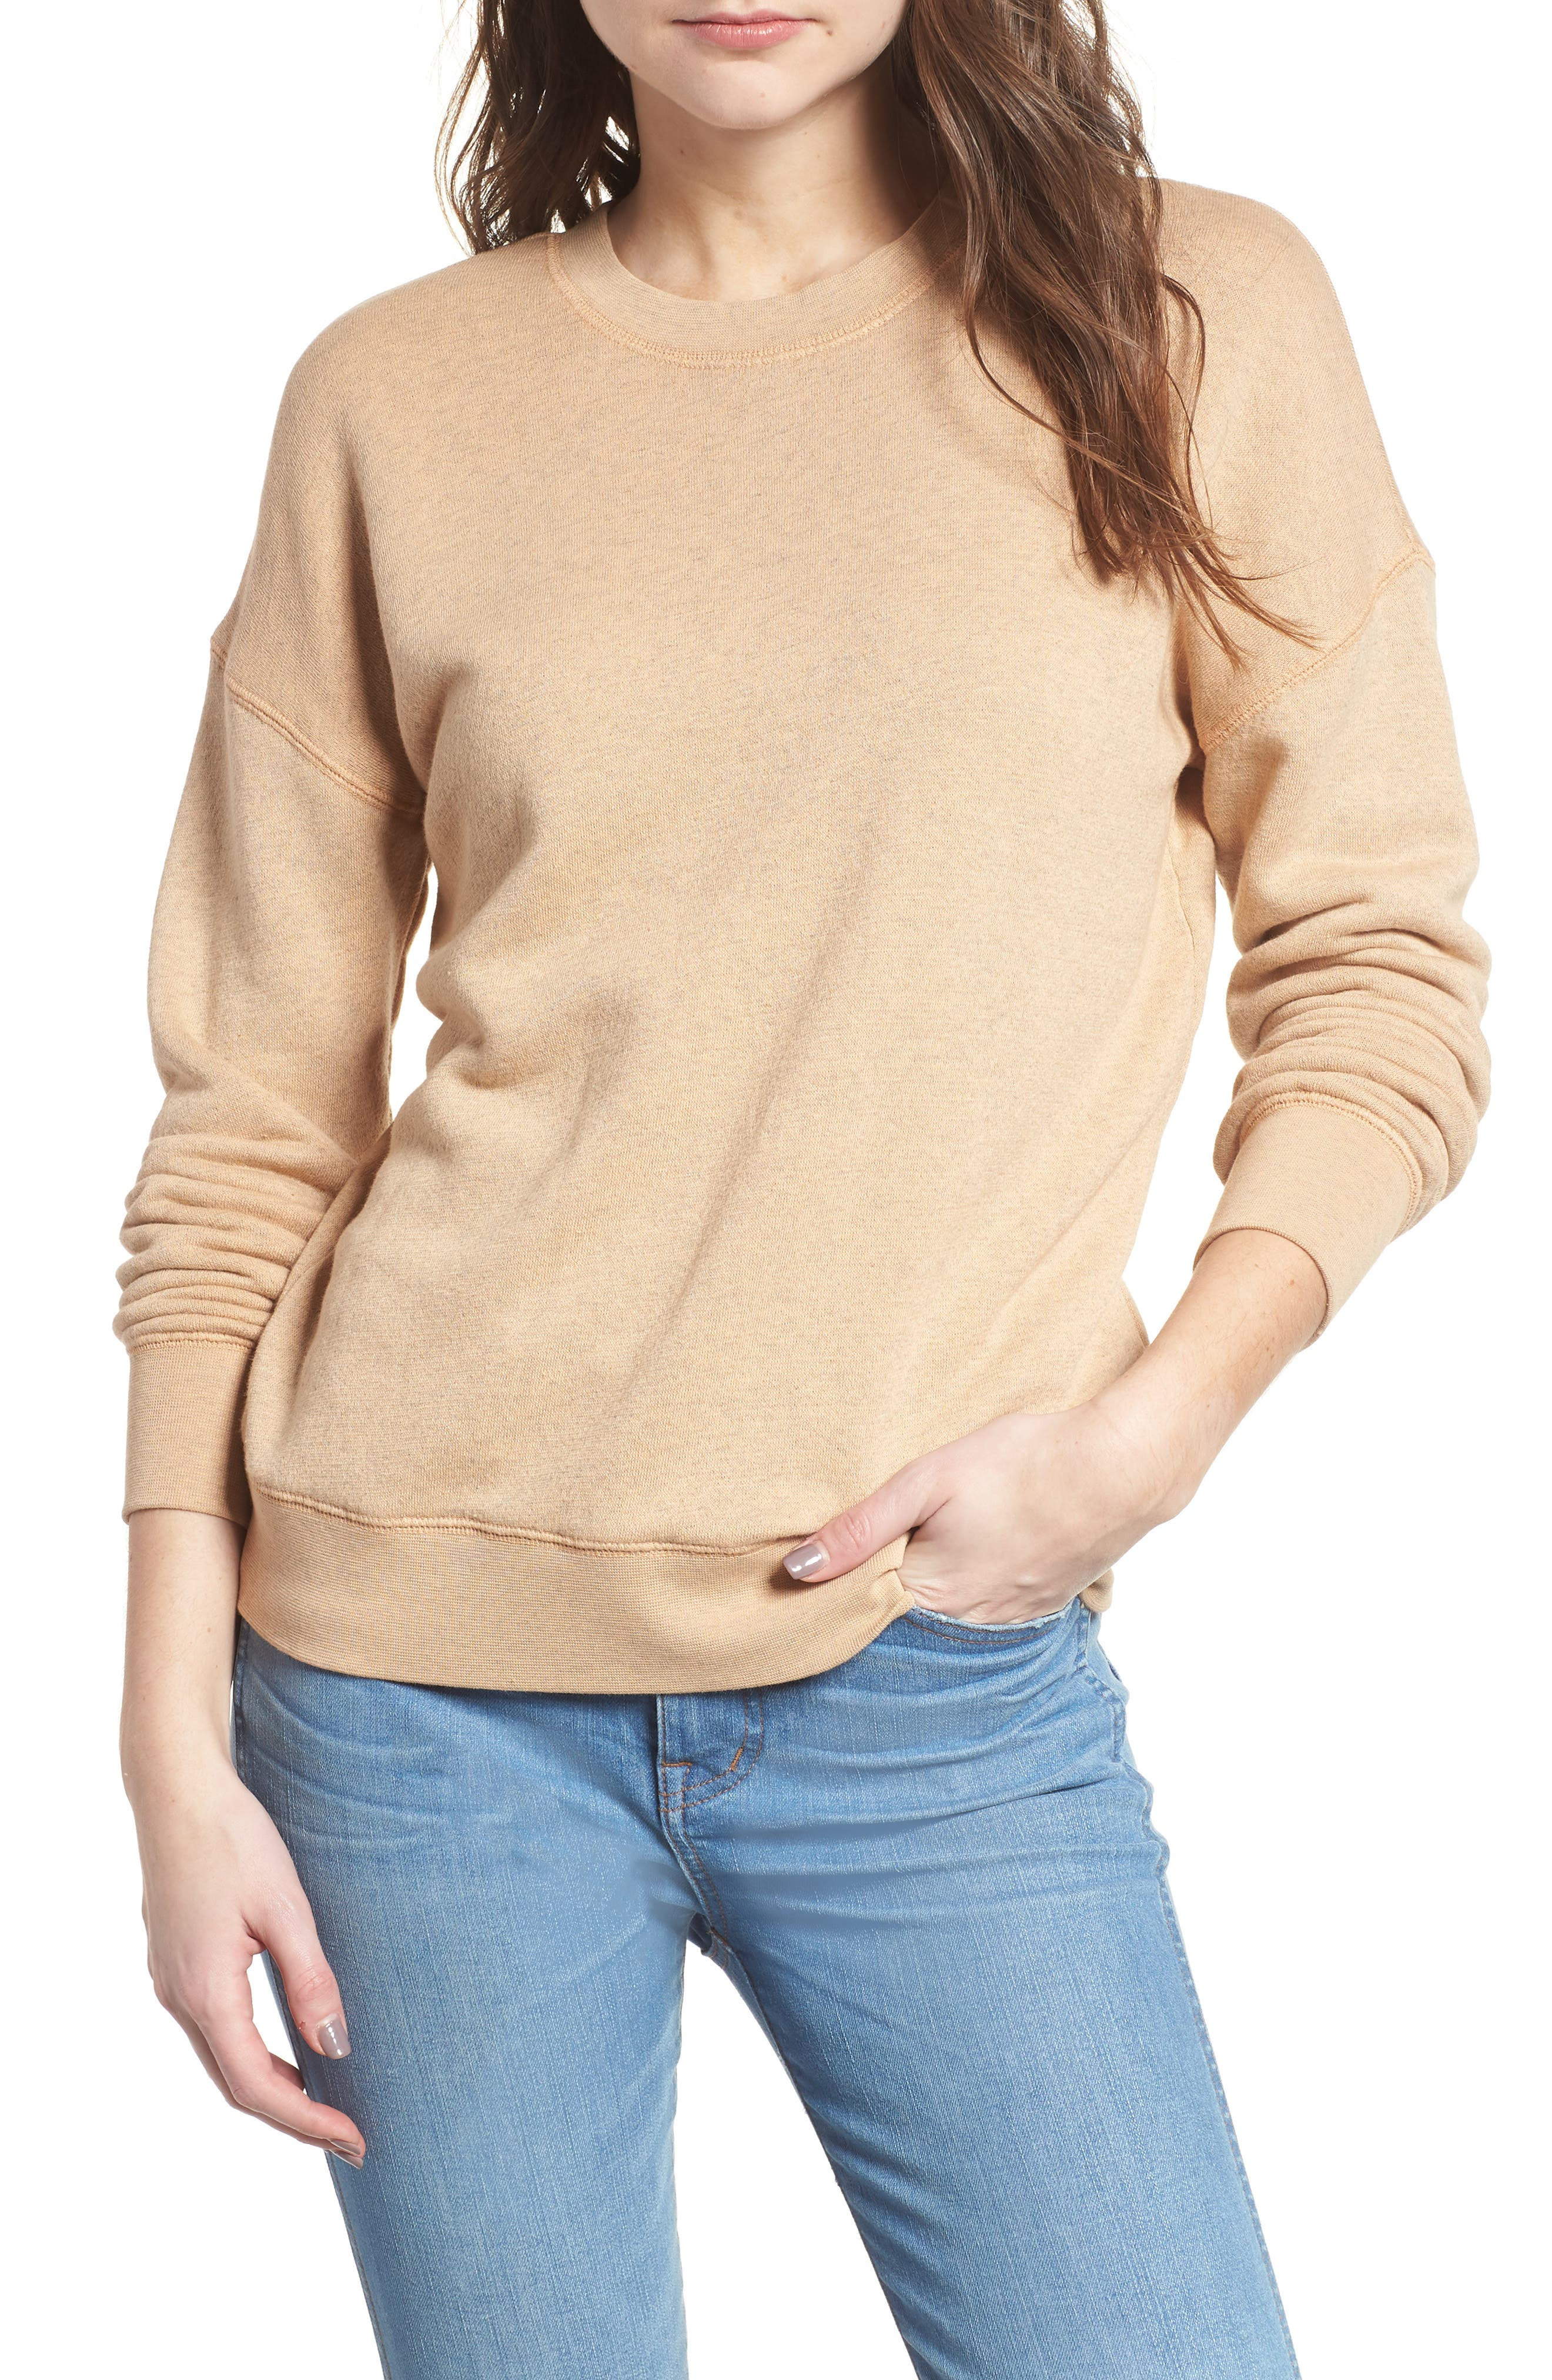 Madewell Mainstay Sweatshirt